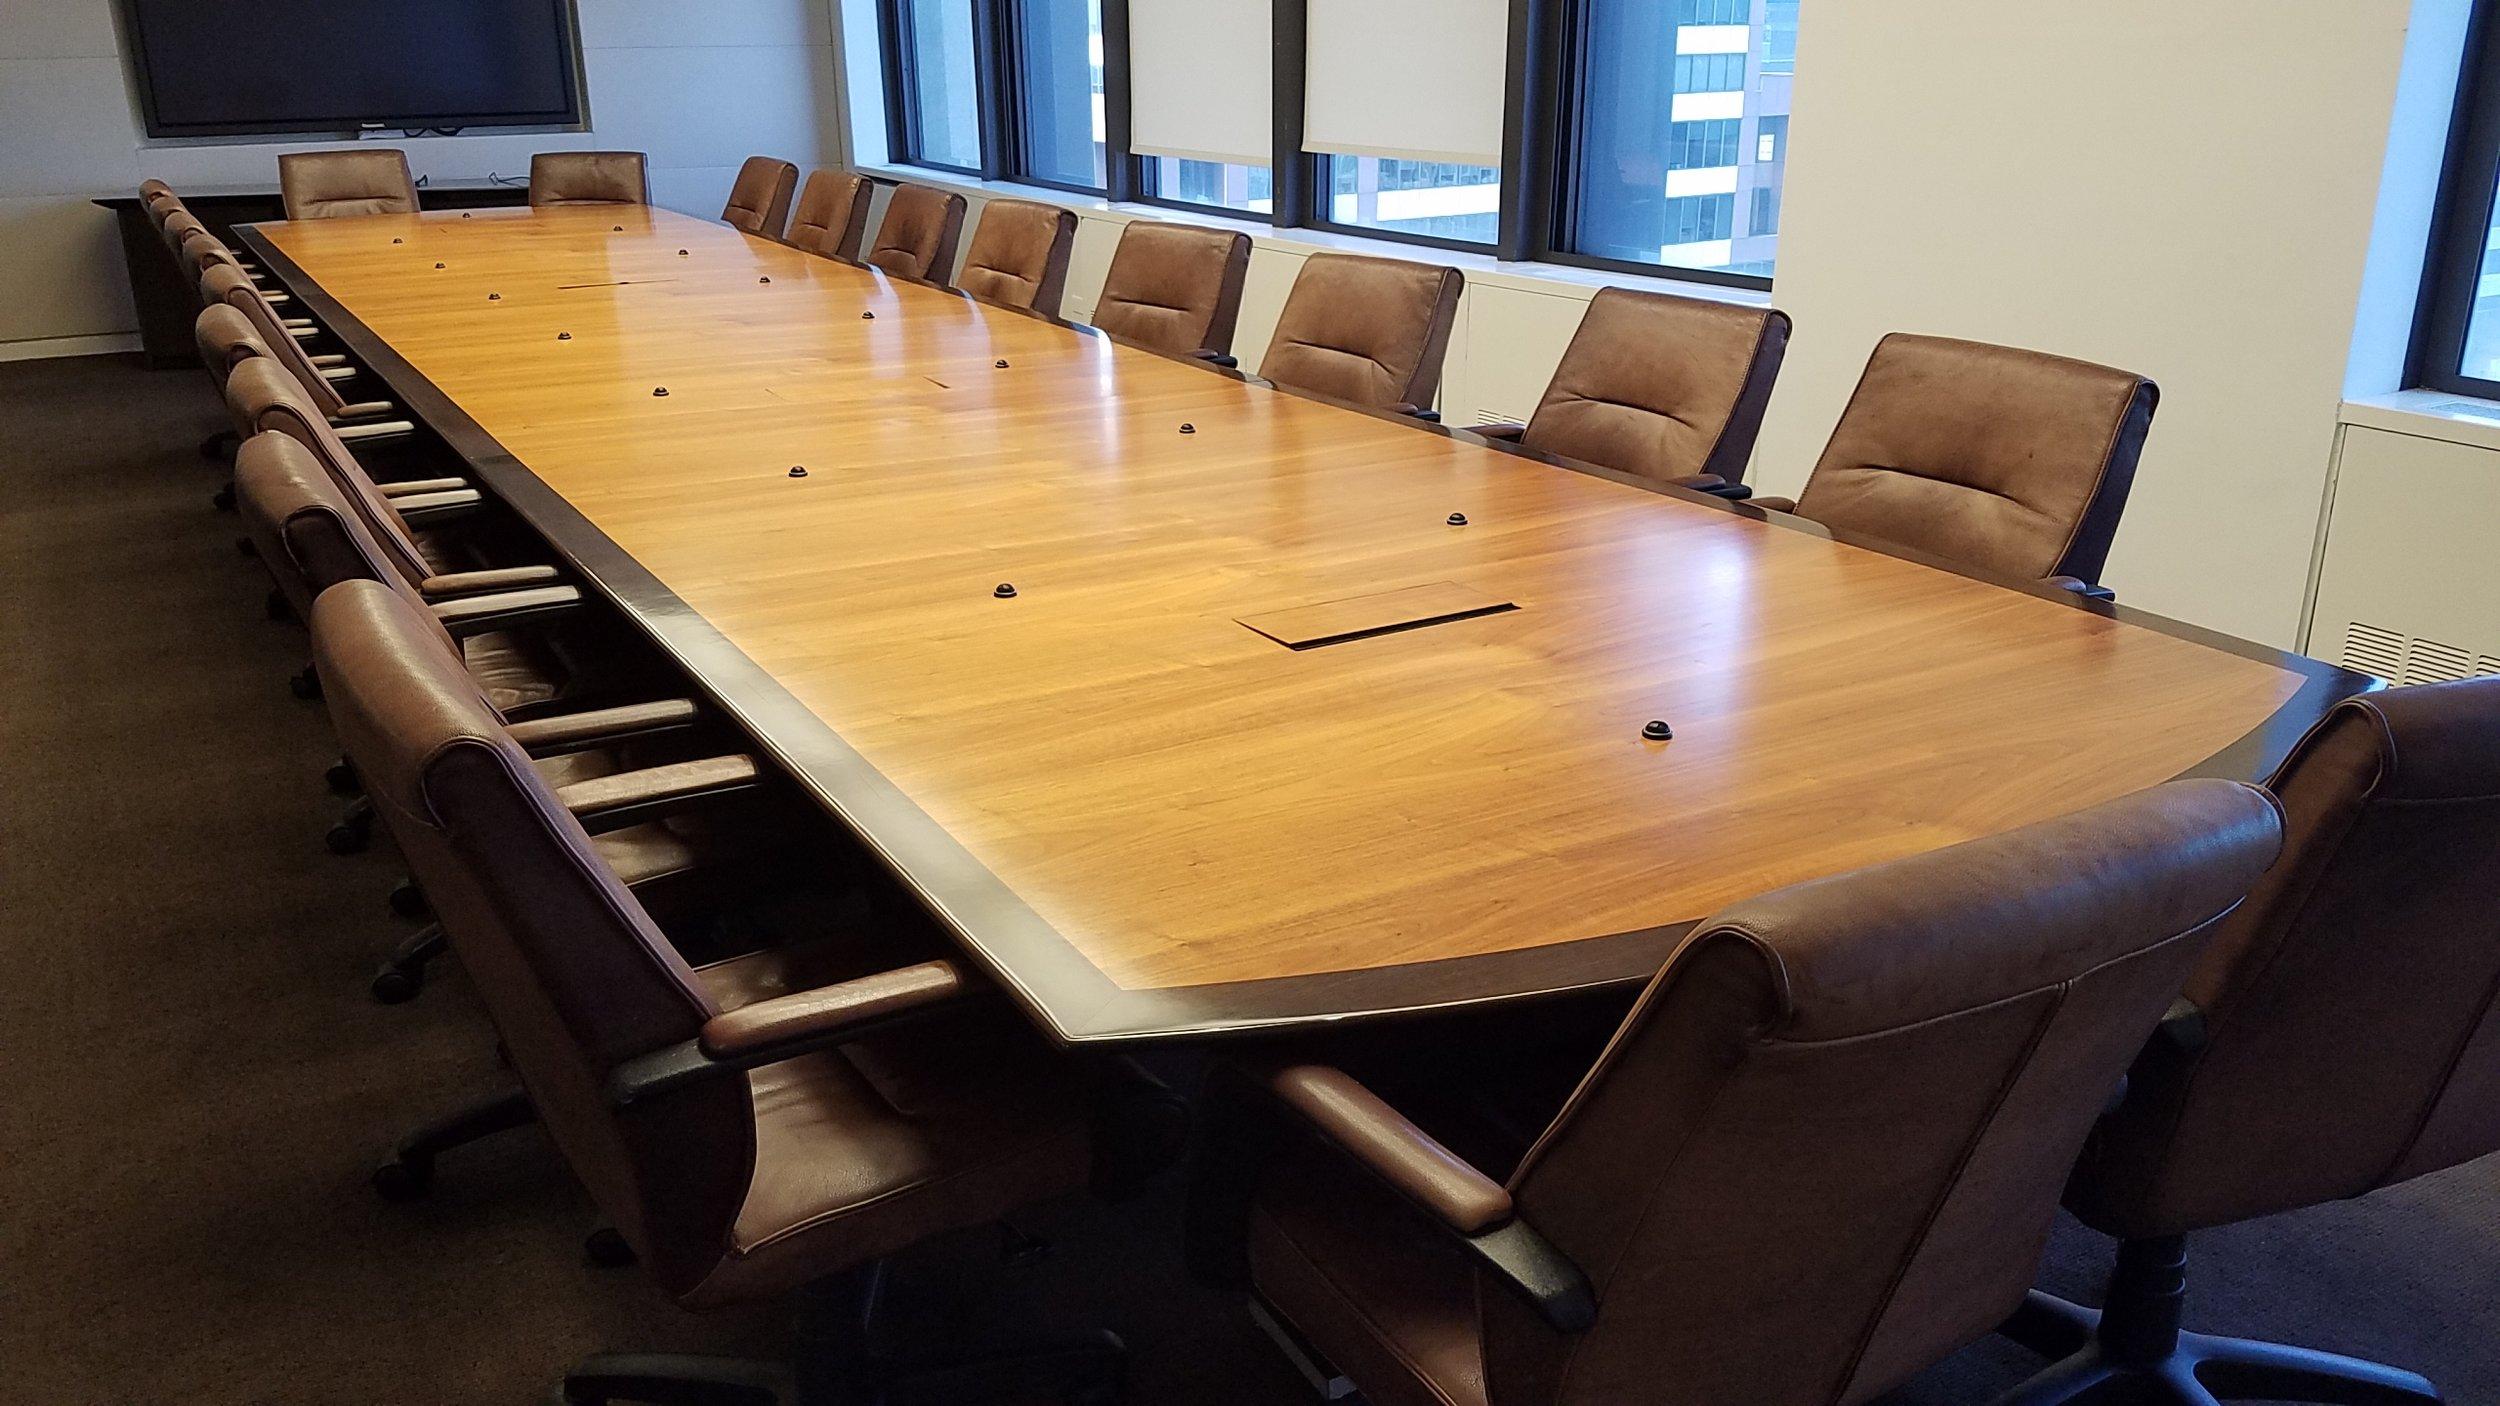 26FOOT X 66INCH TABLE.jpg